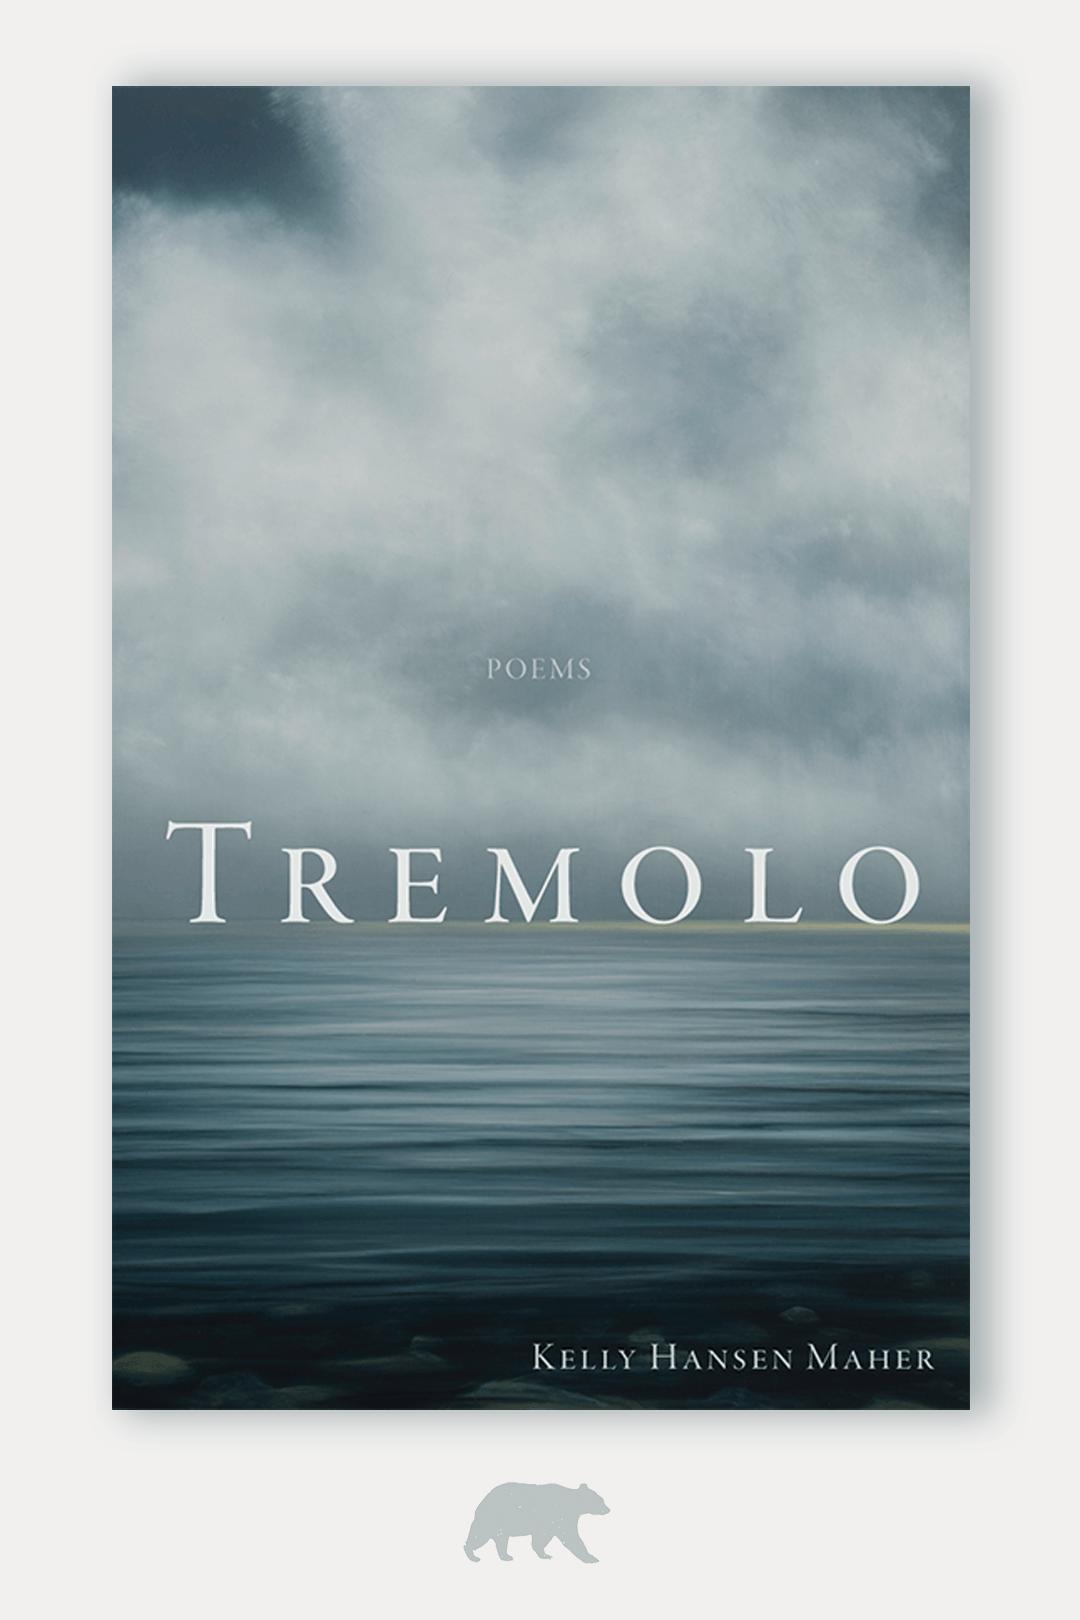 Tremolo | Tinderbox Editions | Book Design by nikkita.co graphic design | http://nikkita.co